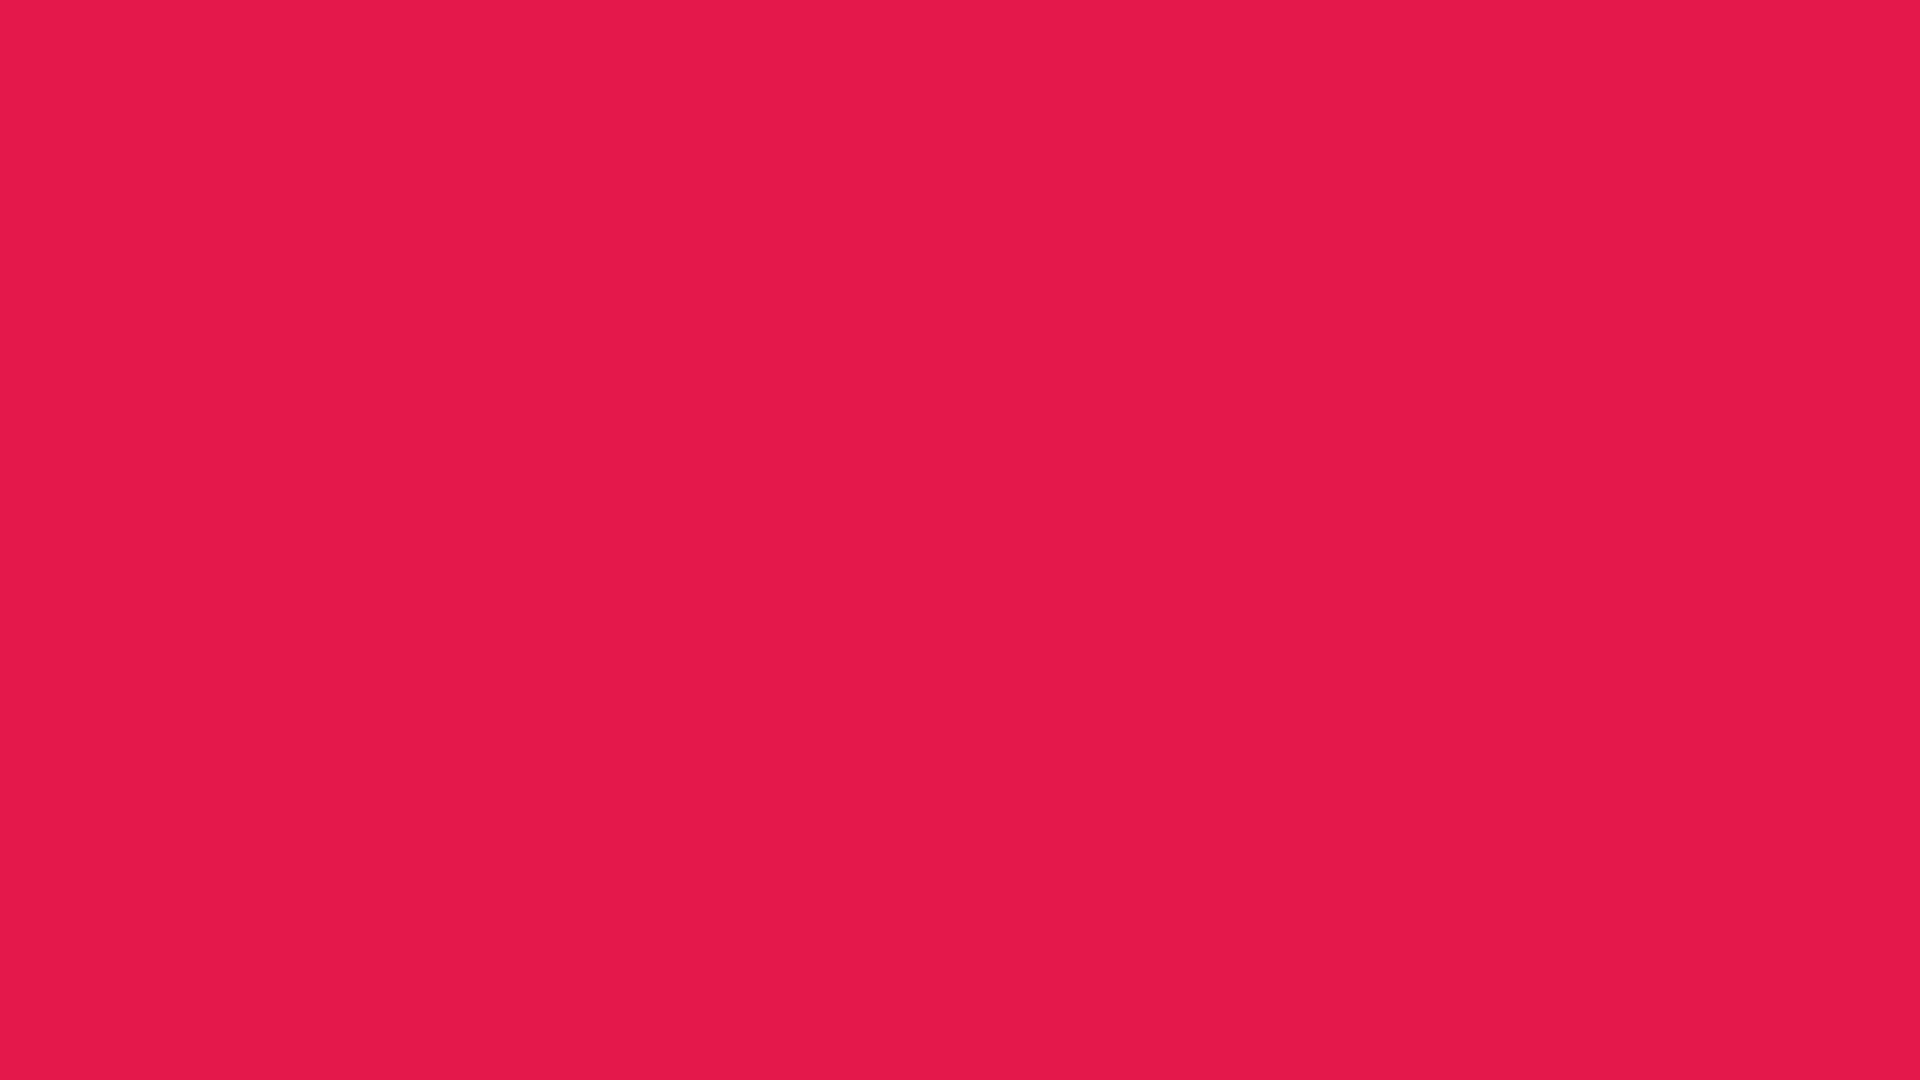 1920x1080 Spanish Crimson Solid Color Background